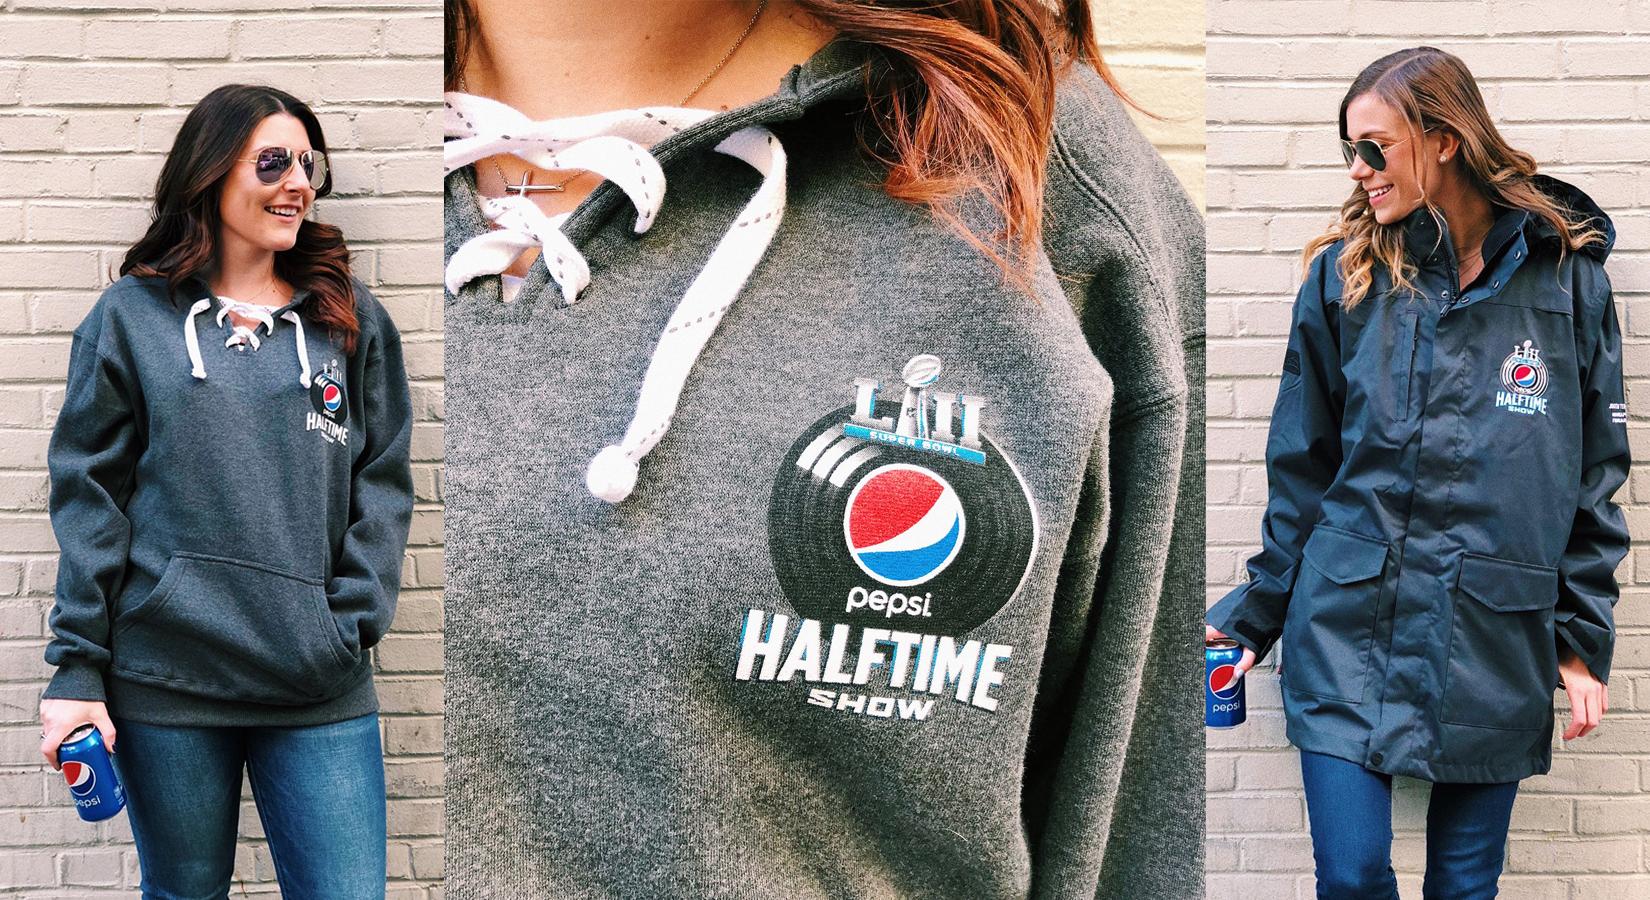 #CreatedByCaptiv8: Super Bowl LII Halftime Sweatshirts & Jackets